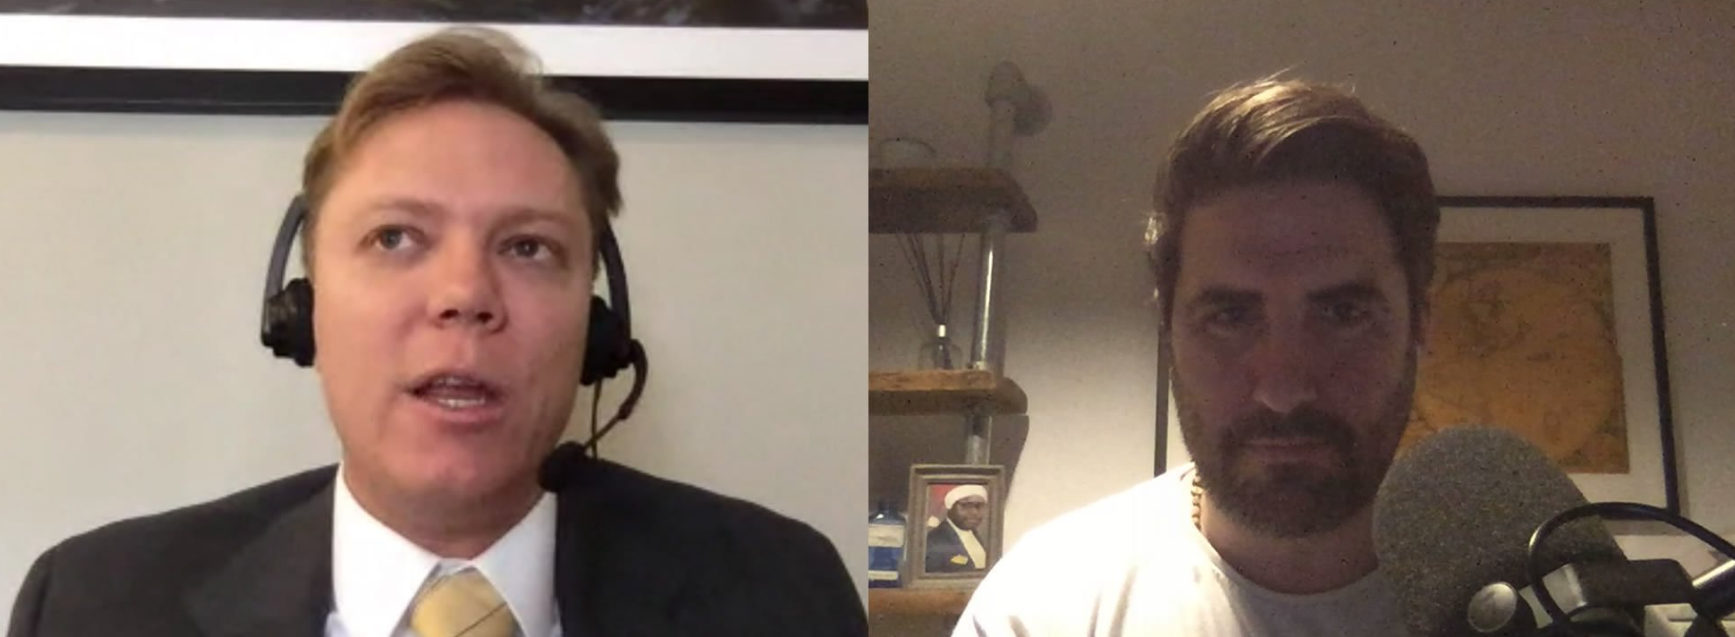 McCormack durante uno de los podcast (Foto: Twitter @PeterMcCormack)